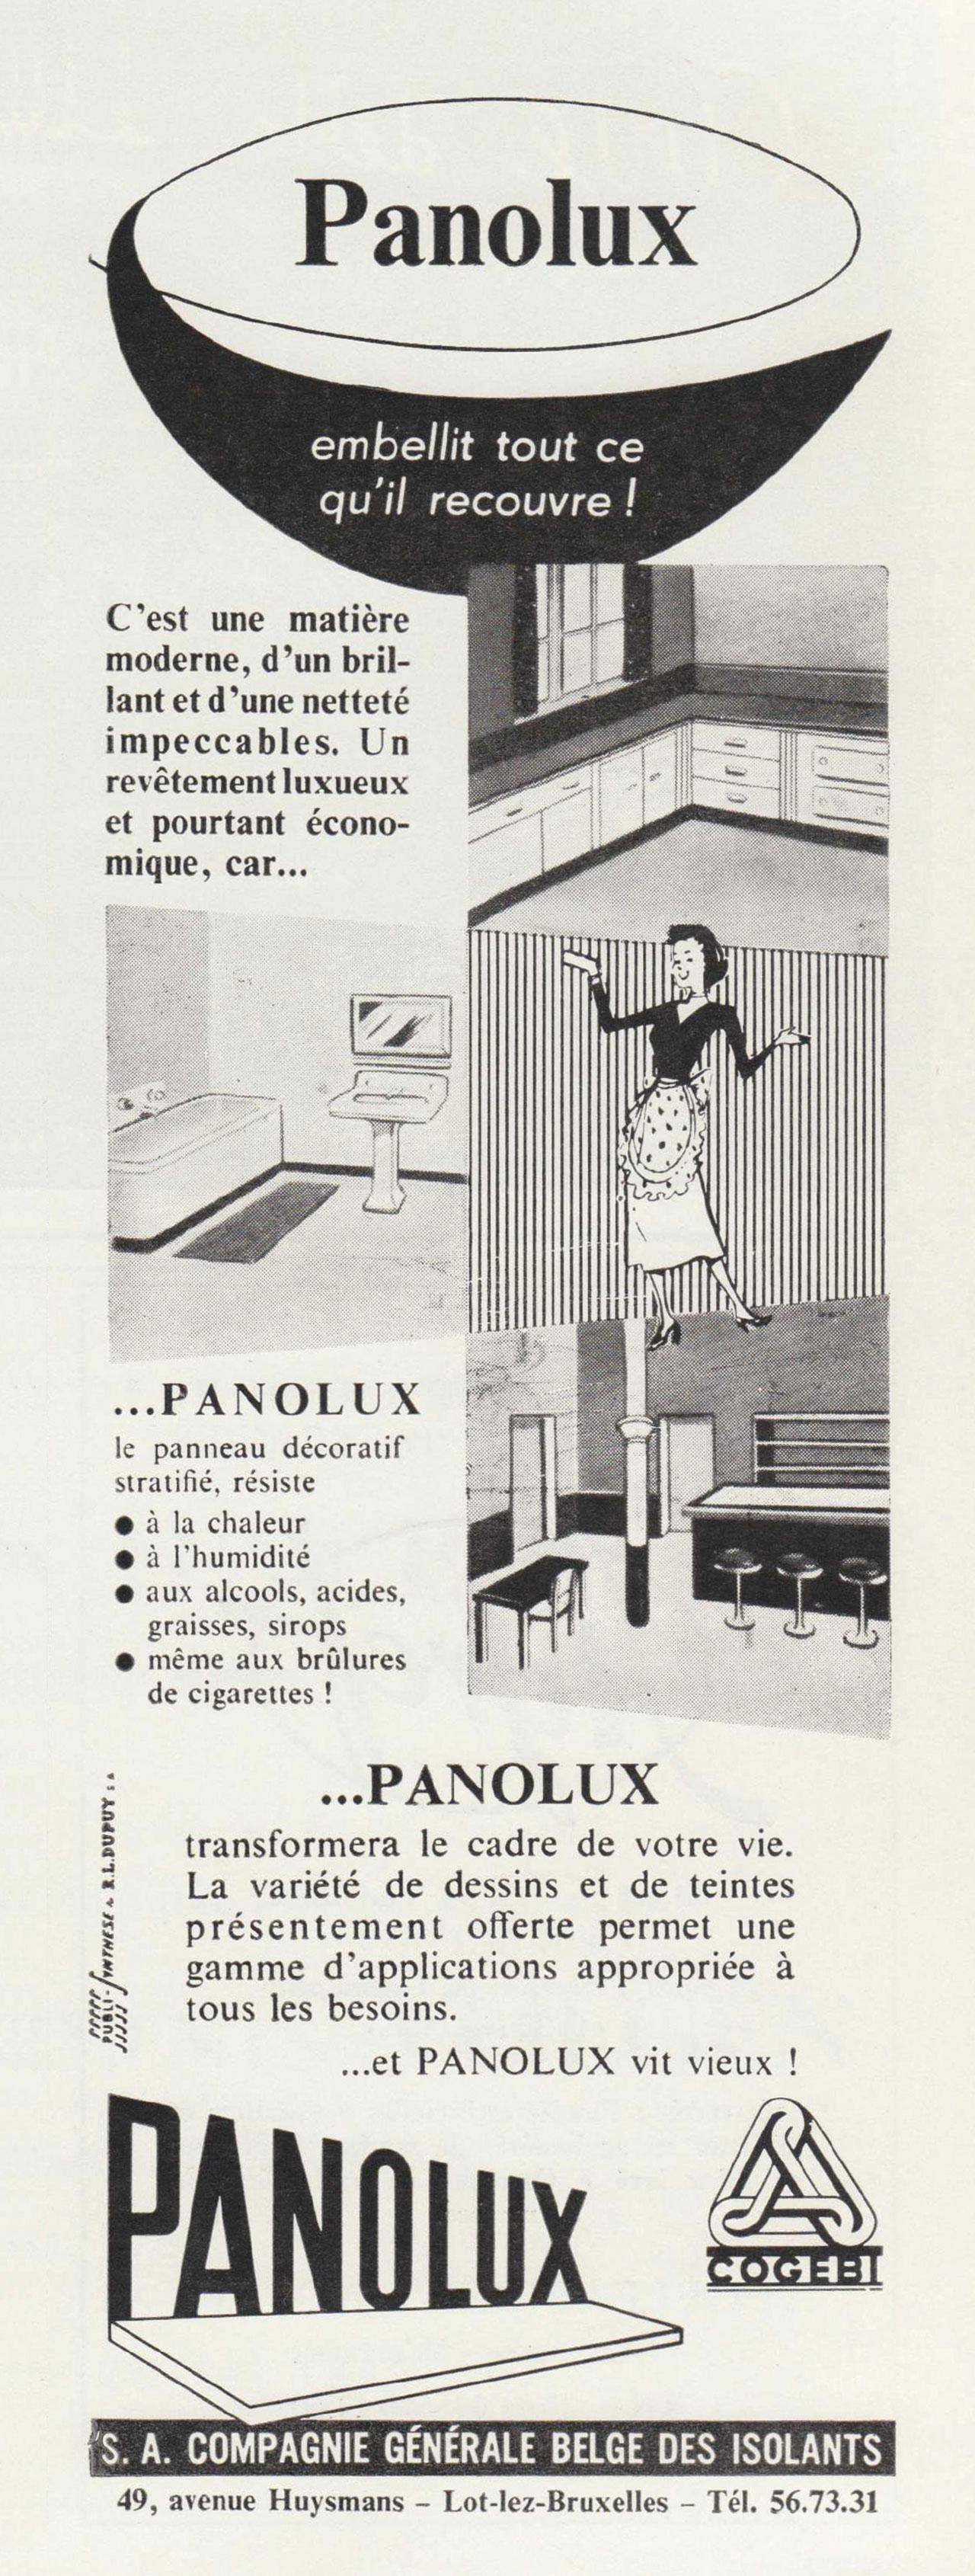 Panolux